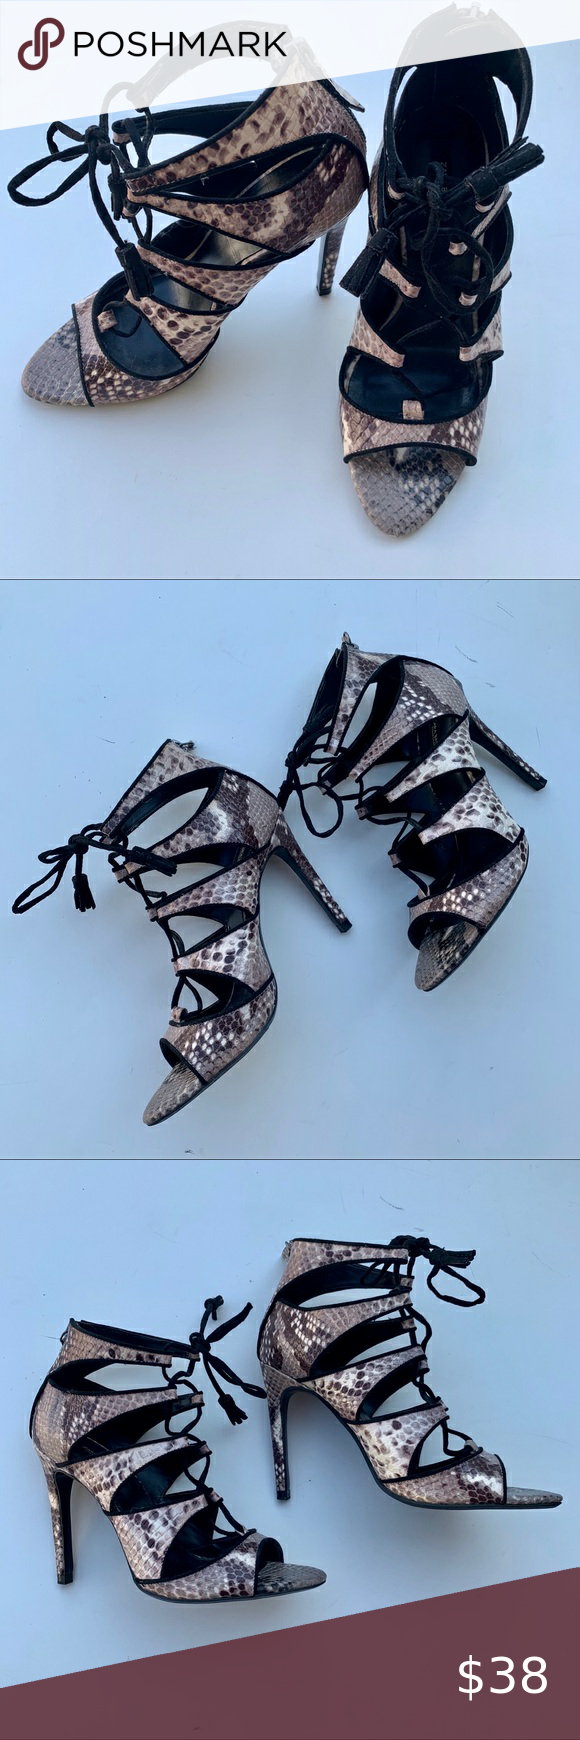 Zara Python Skin Lace Up Sandal Heels In 2020 Lace Up Sandals Sandals Heels Lace Up Sandal Heels